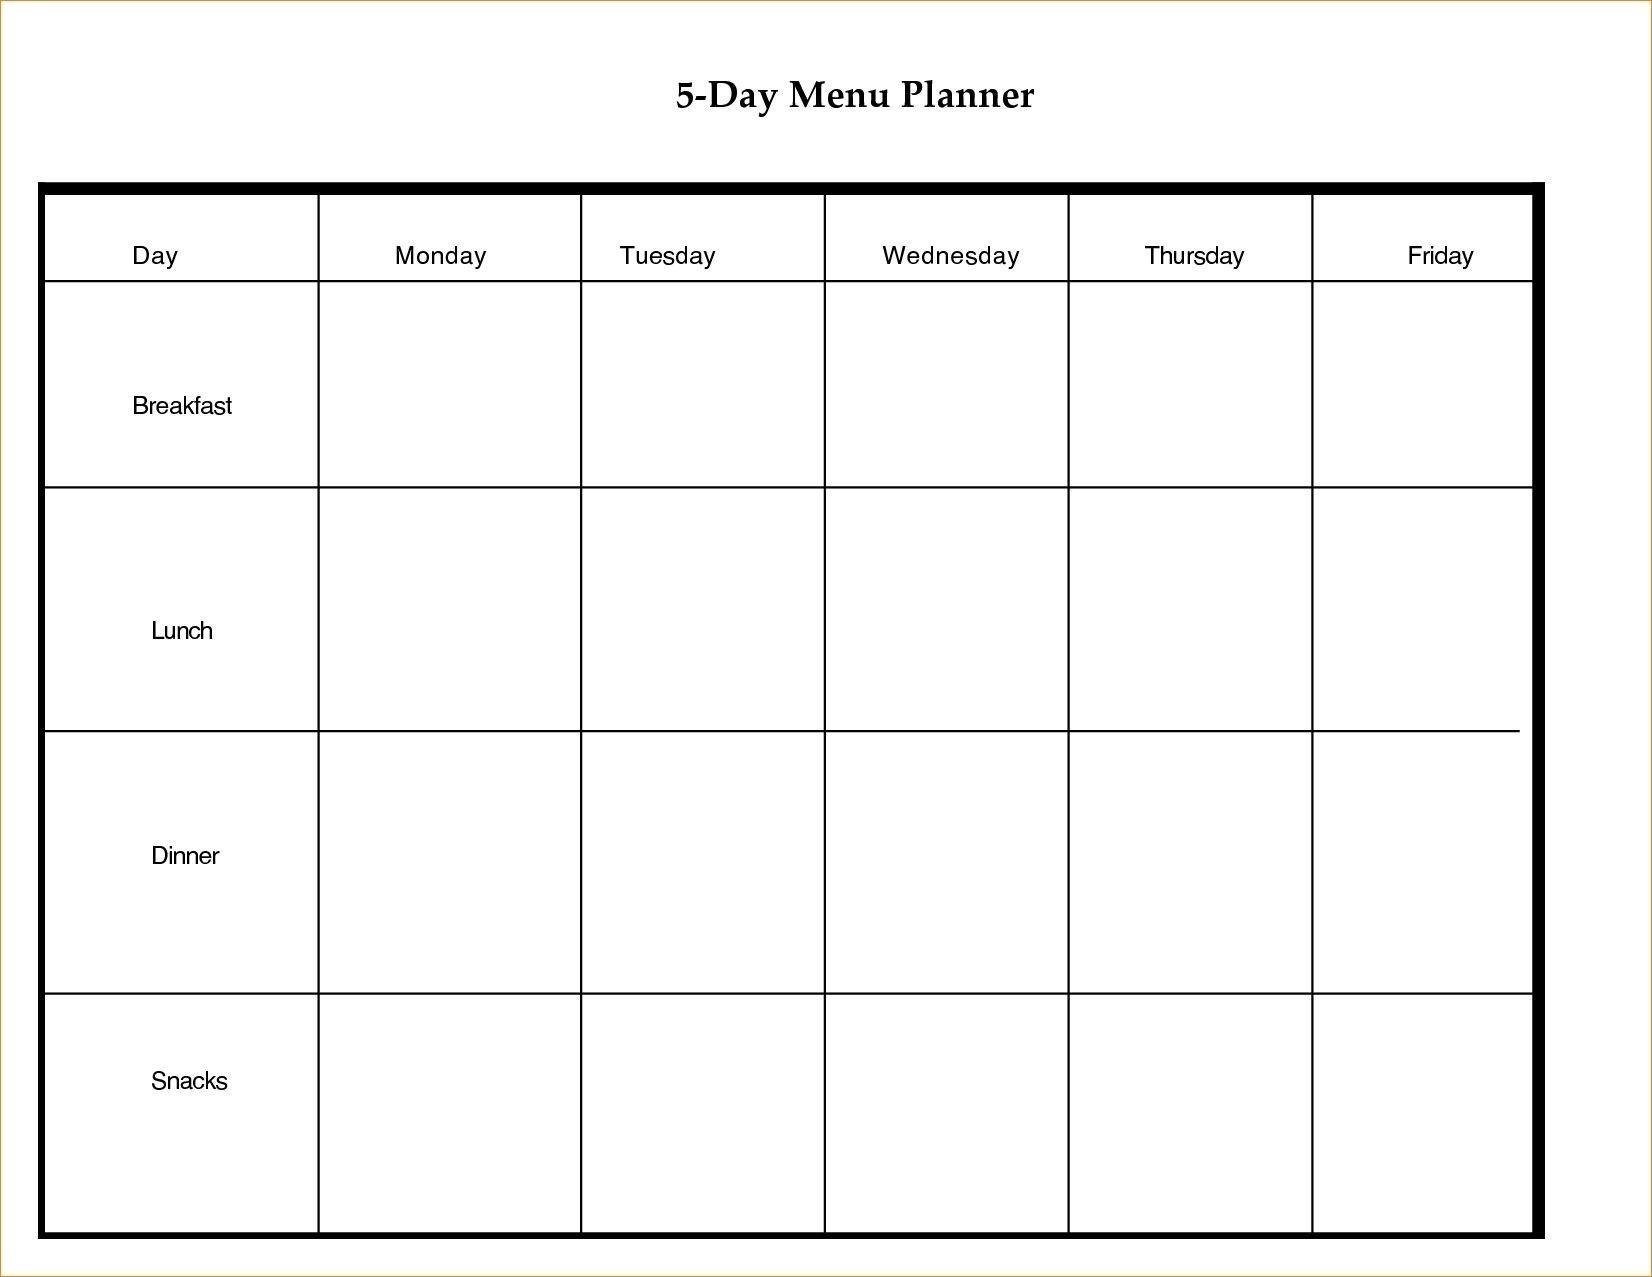 Blank 5 Day Week Calendar | Blank Calendar Template Dowload-5 Day Monthly Calendar Printable